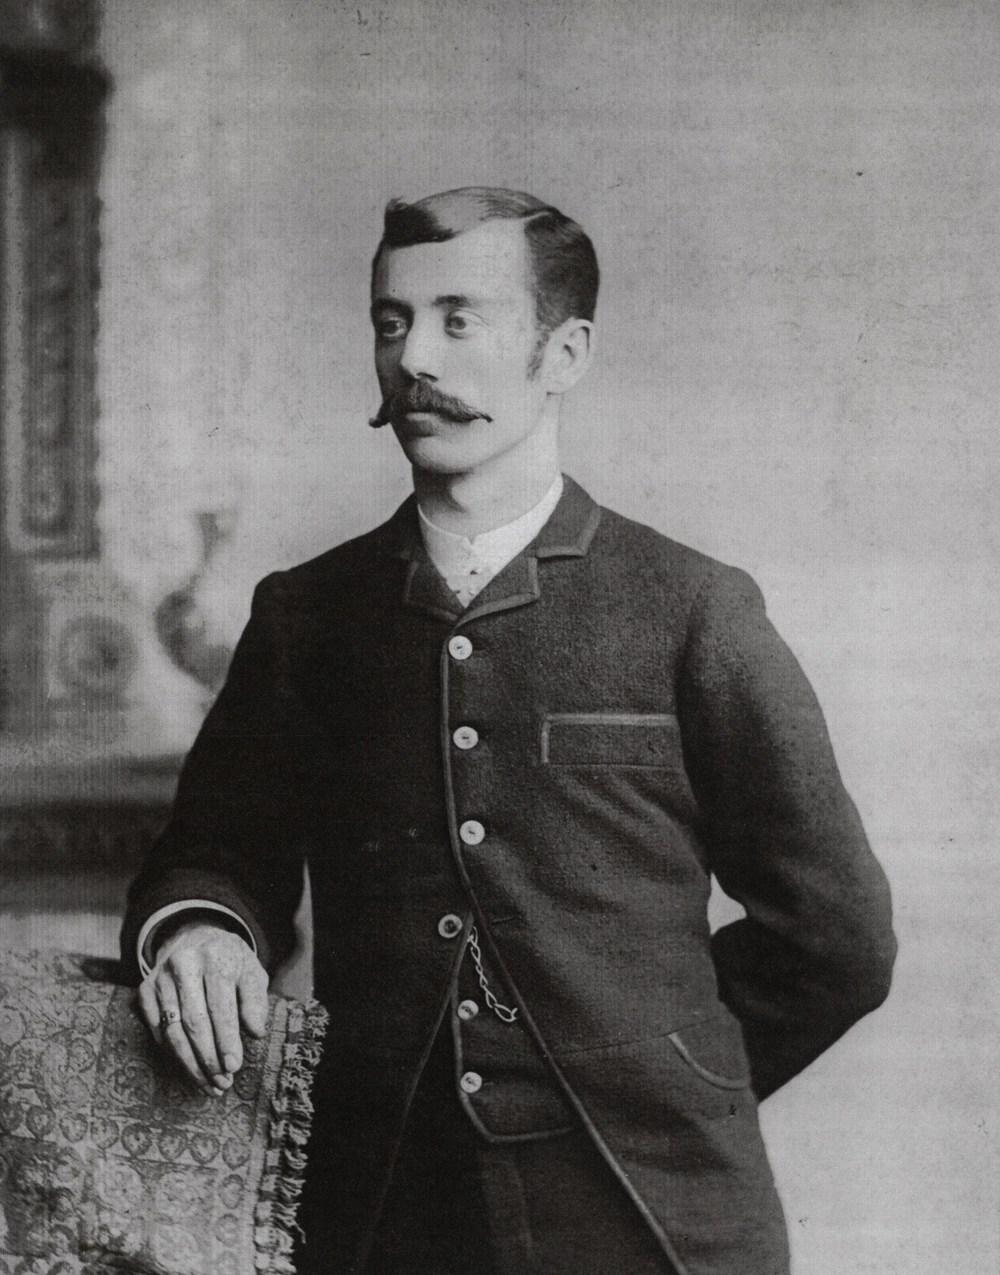 Charles Archibald Bleecker 1857-1945